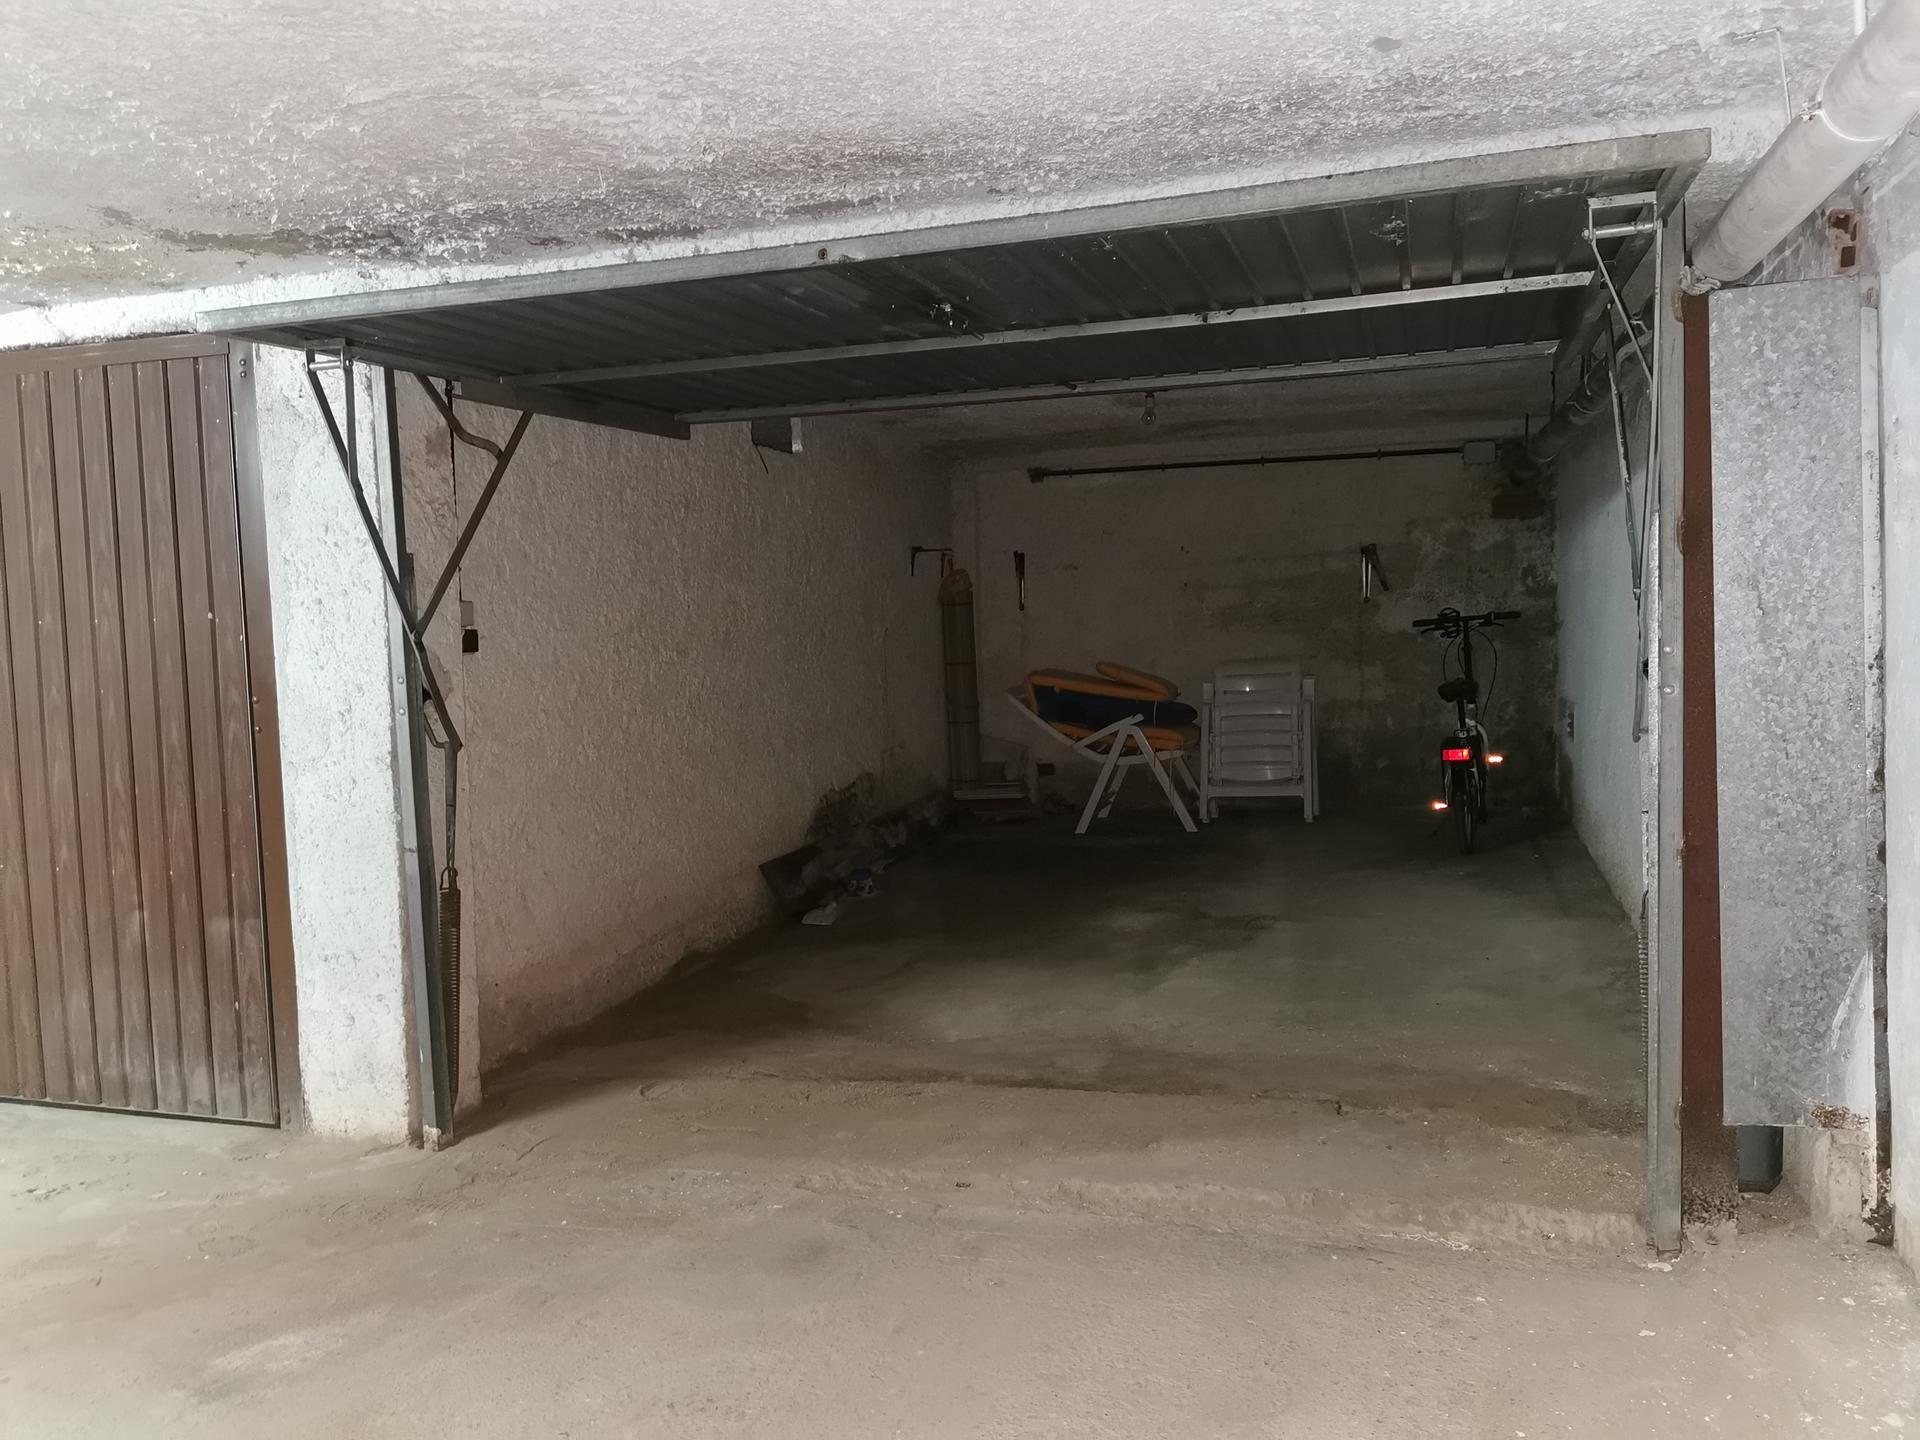 парковка -                                       Cambrils -                                       0 спальни -                                       0 человека